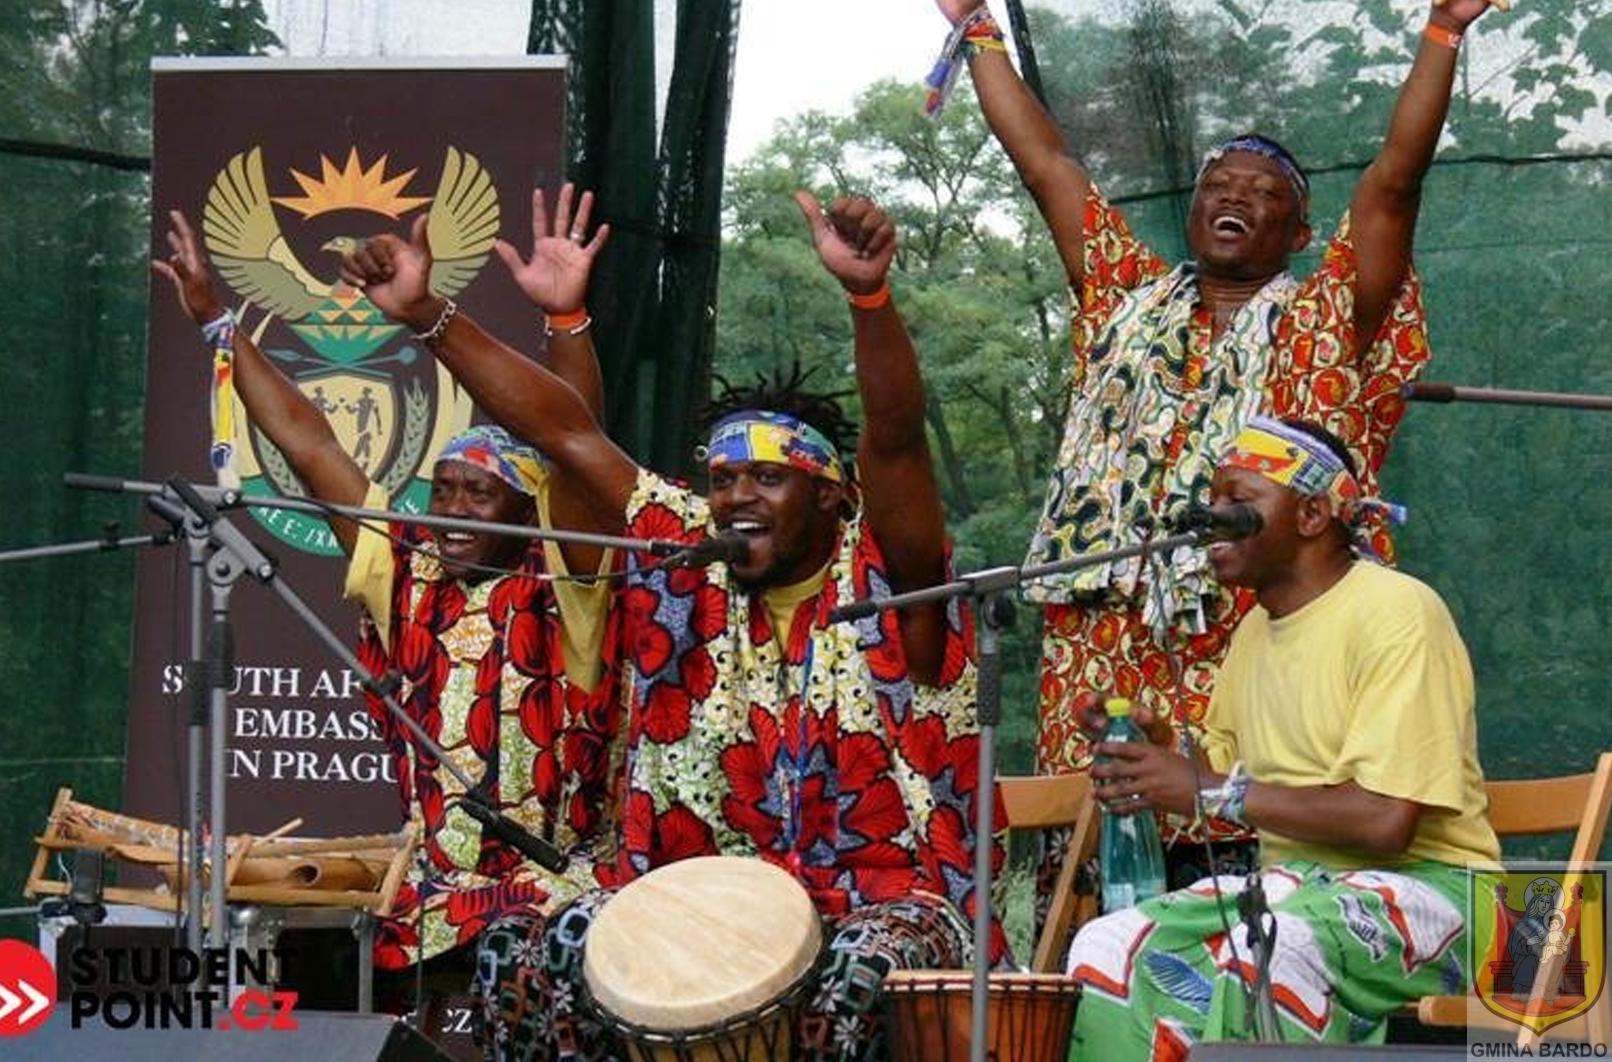 grupa afrykańska